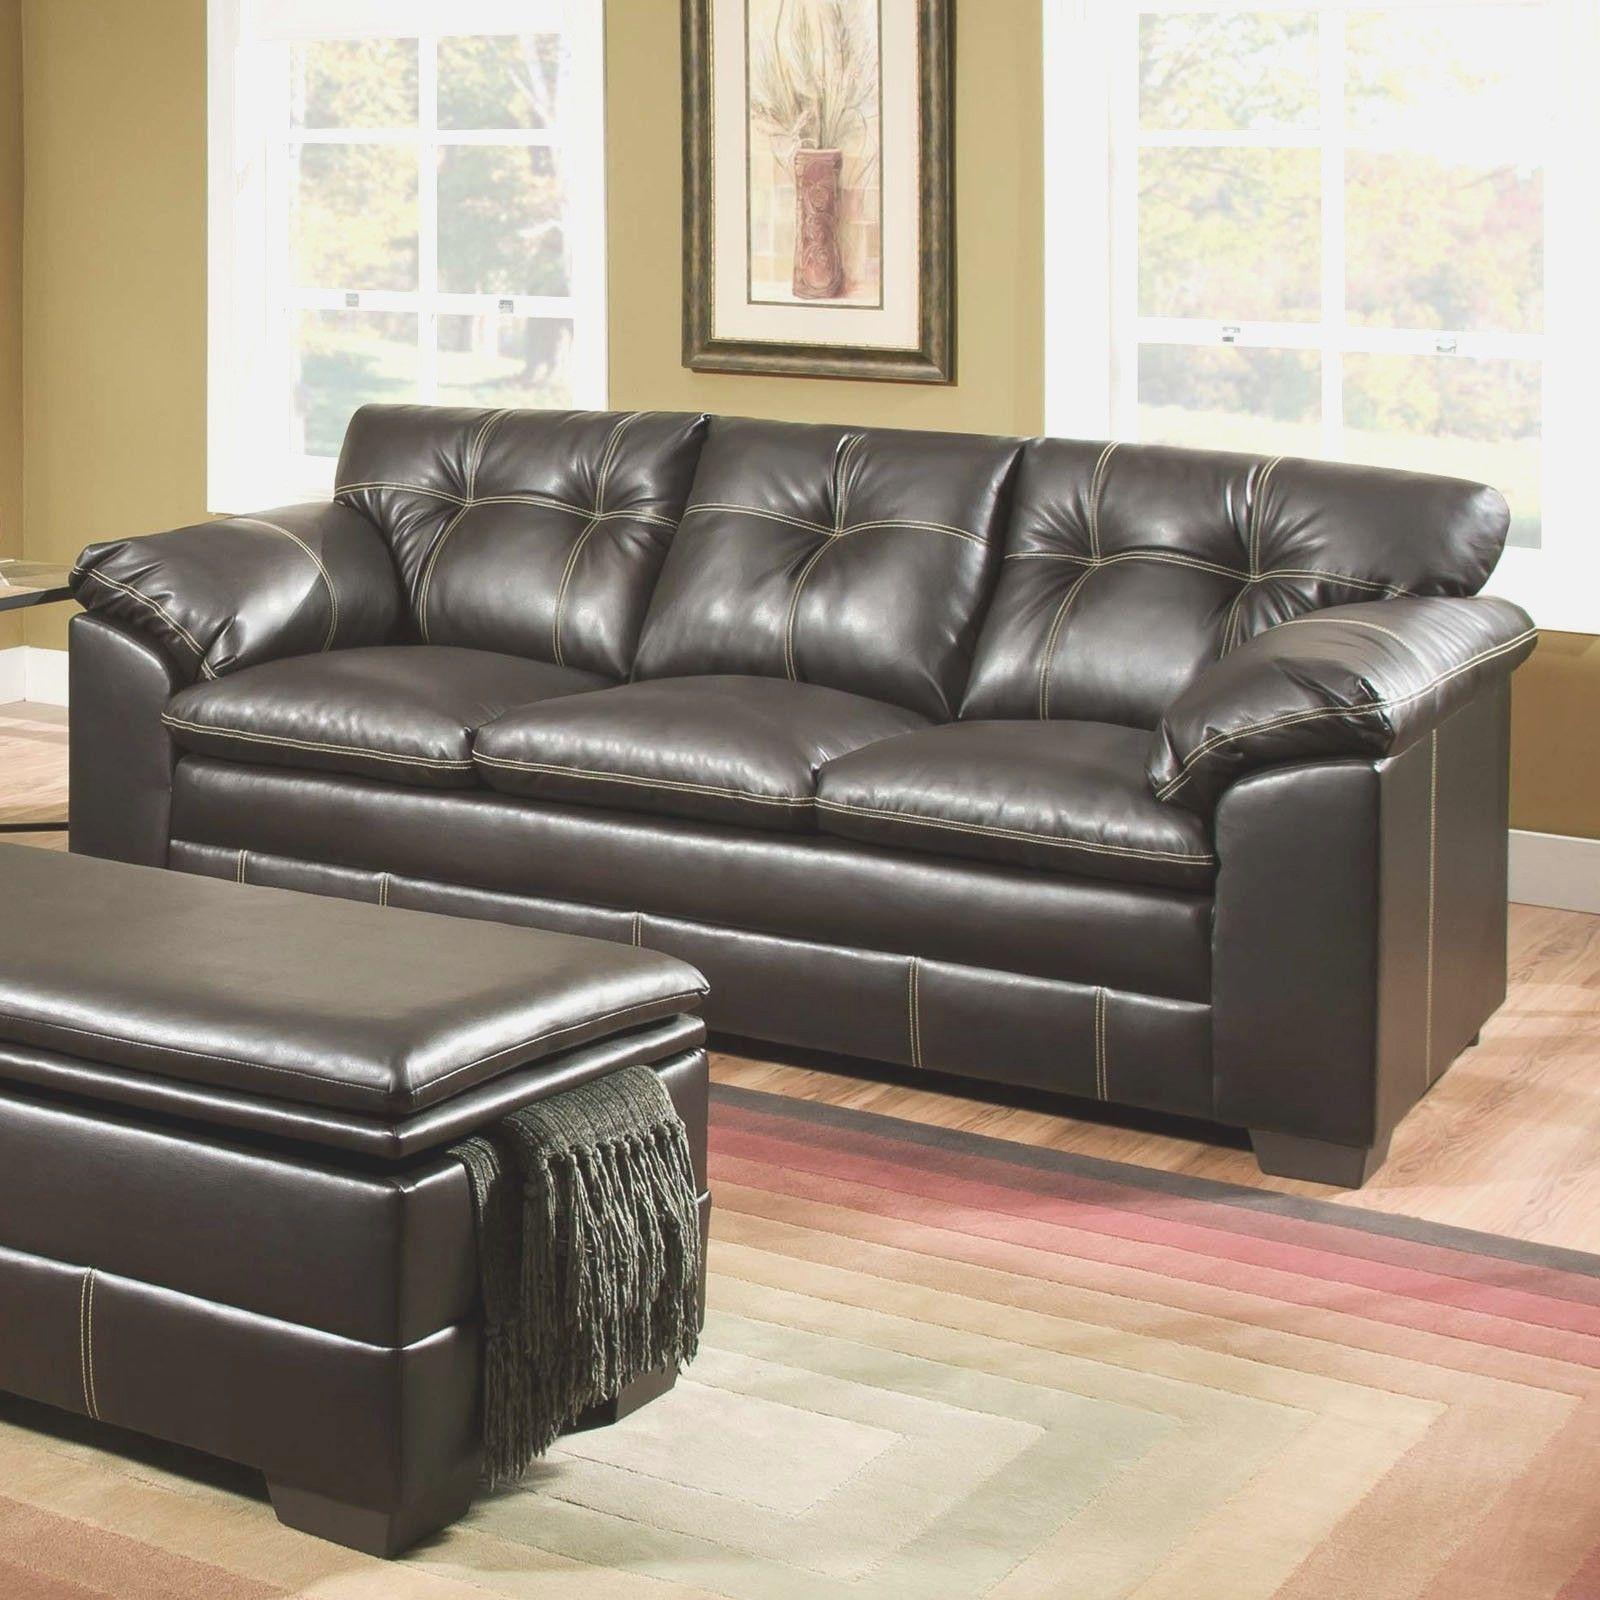 Leather Chair Bed Sleeper Ikea Hanging Swing Big Lots Sofa Furniture Futon Queen